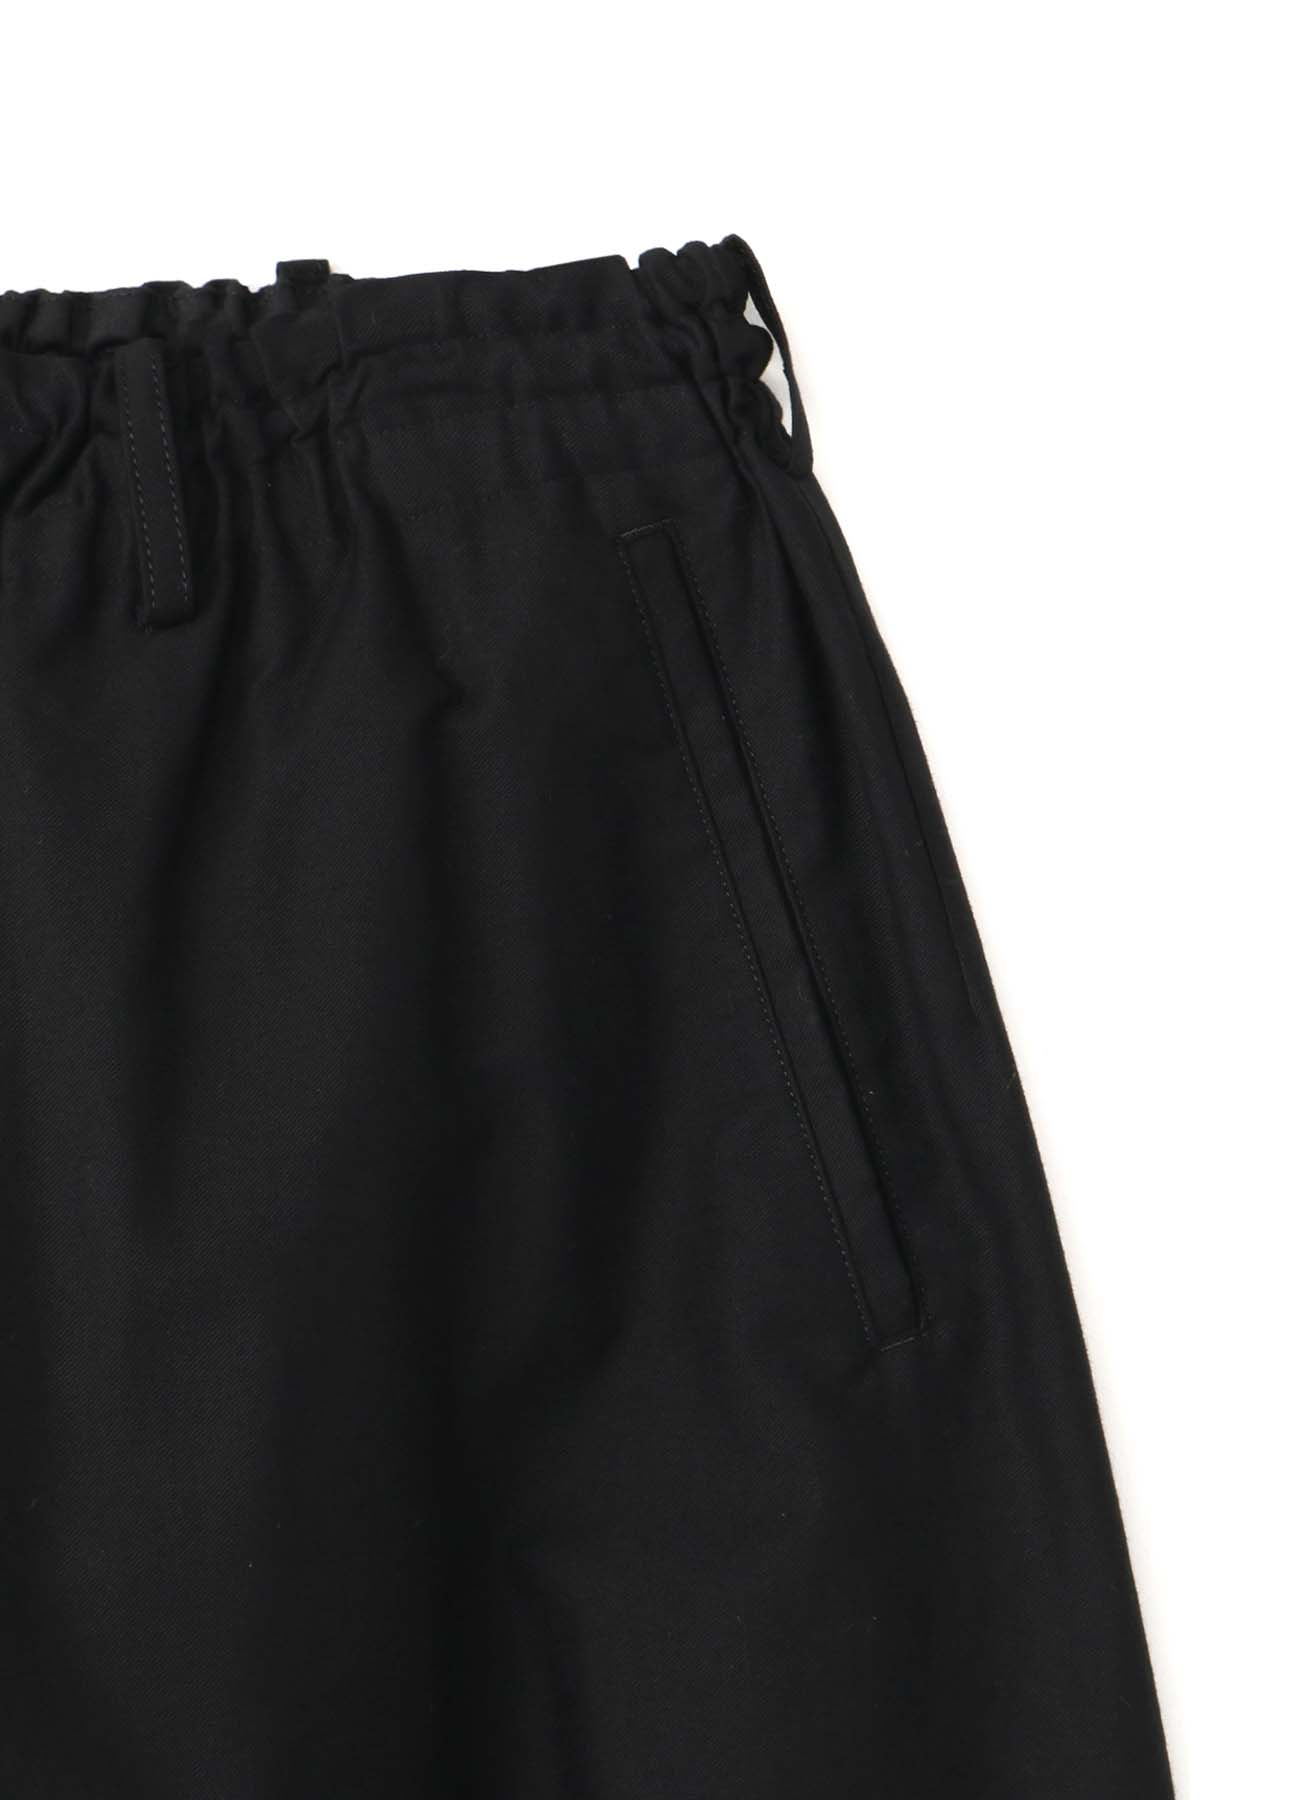 BLACK C/TWILL BUTTON OPEN PANTS